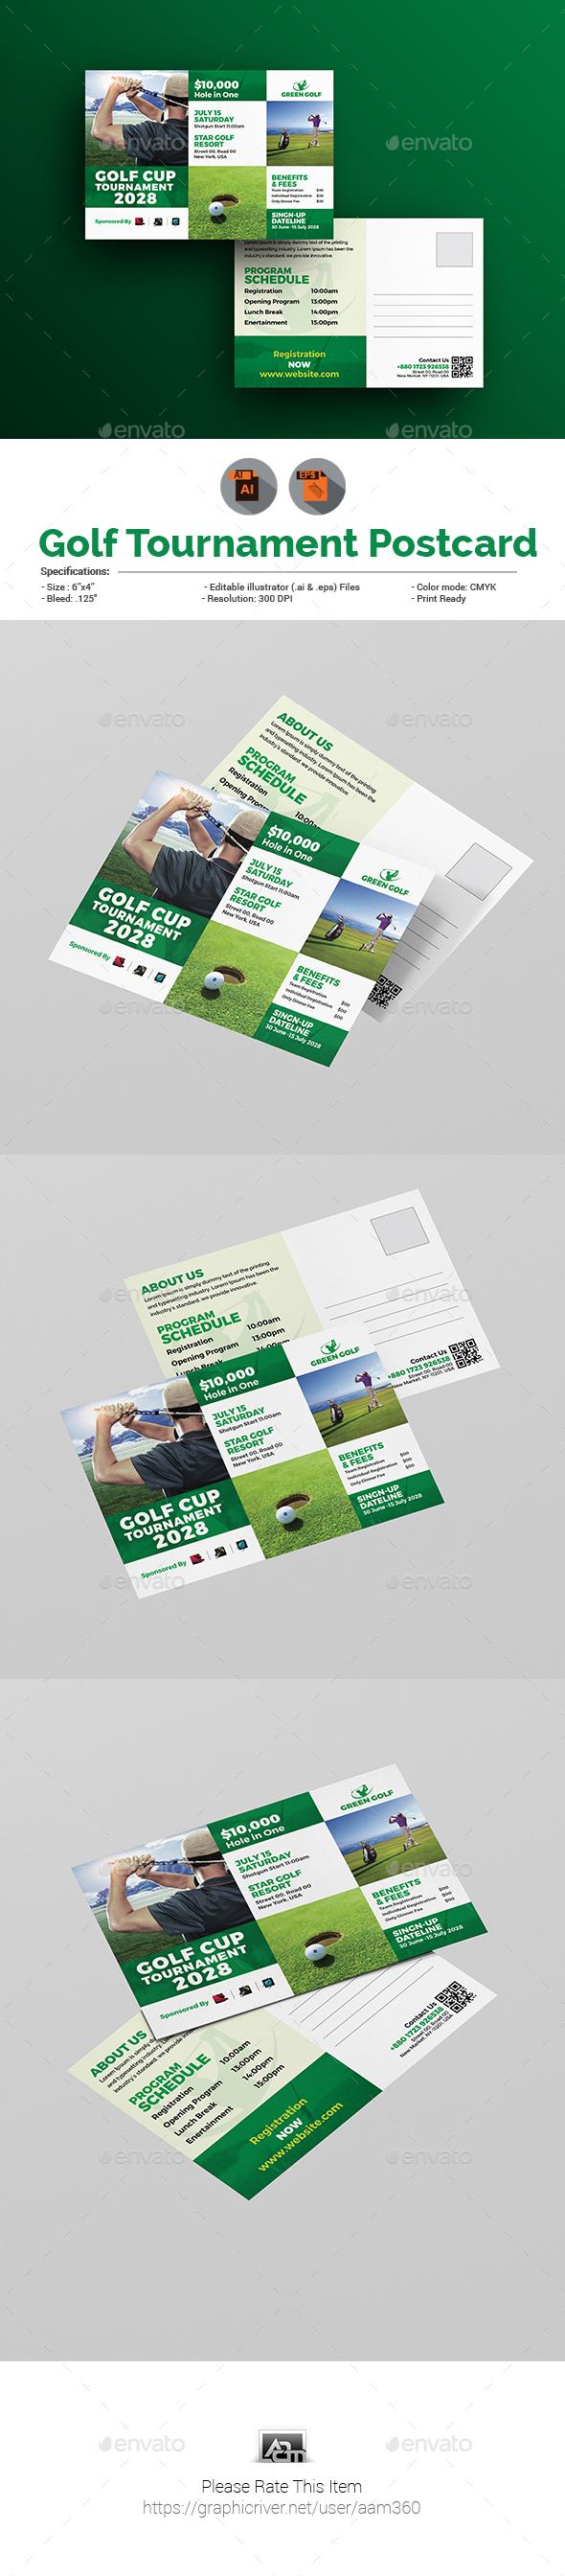 Golf Tournament Postcard - Cards & Invites Print Templates